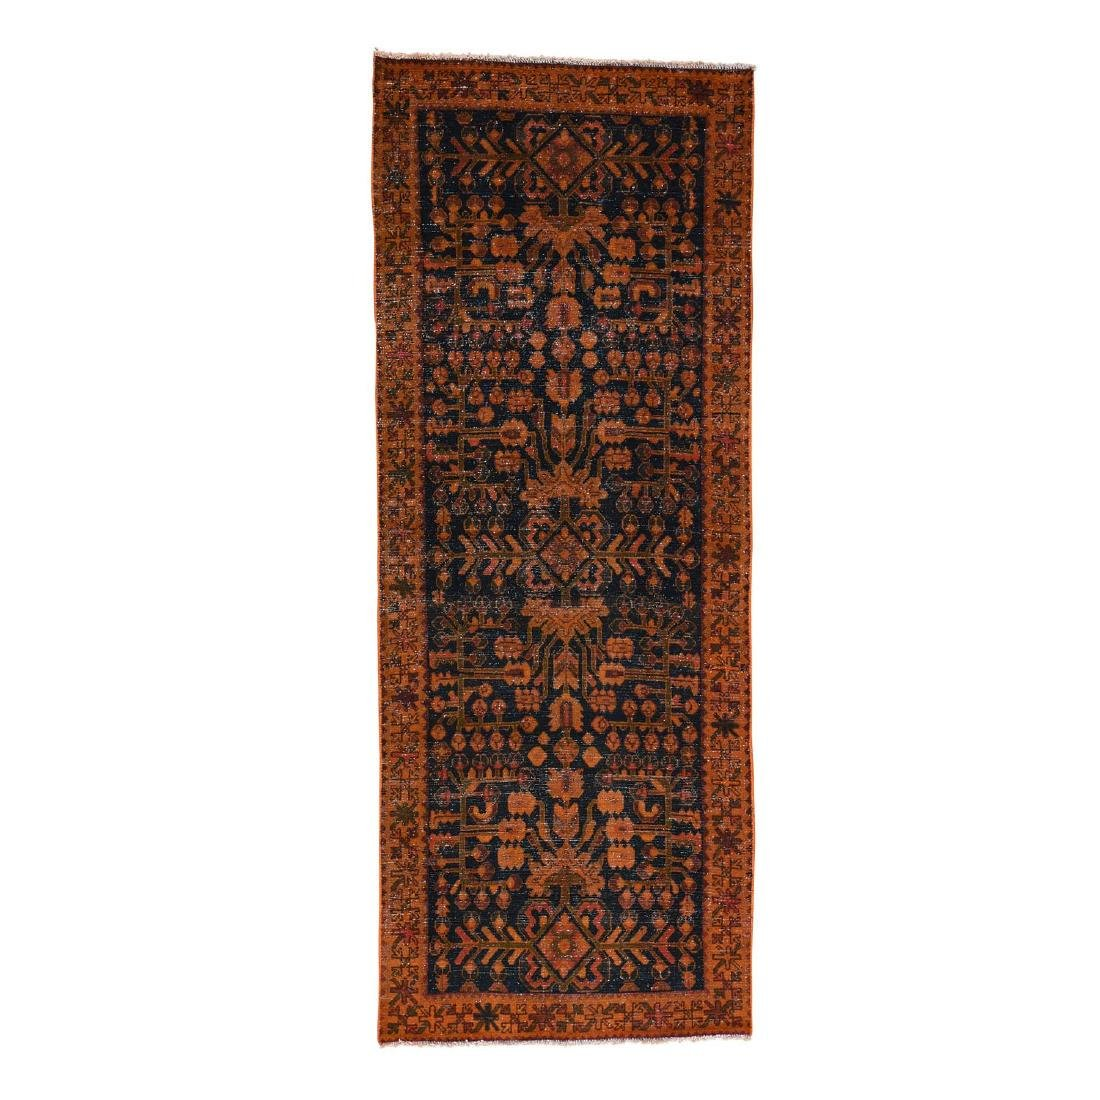 Handmade Persian Lilahan Vintage Runner Rug 3.7x9.4